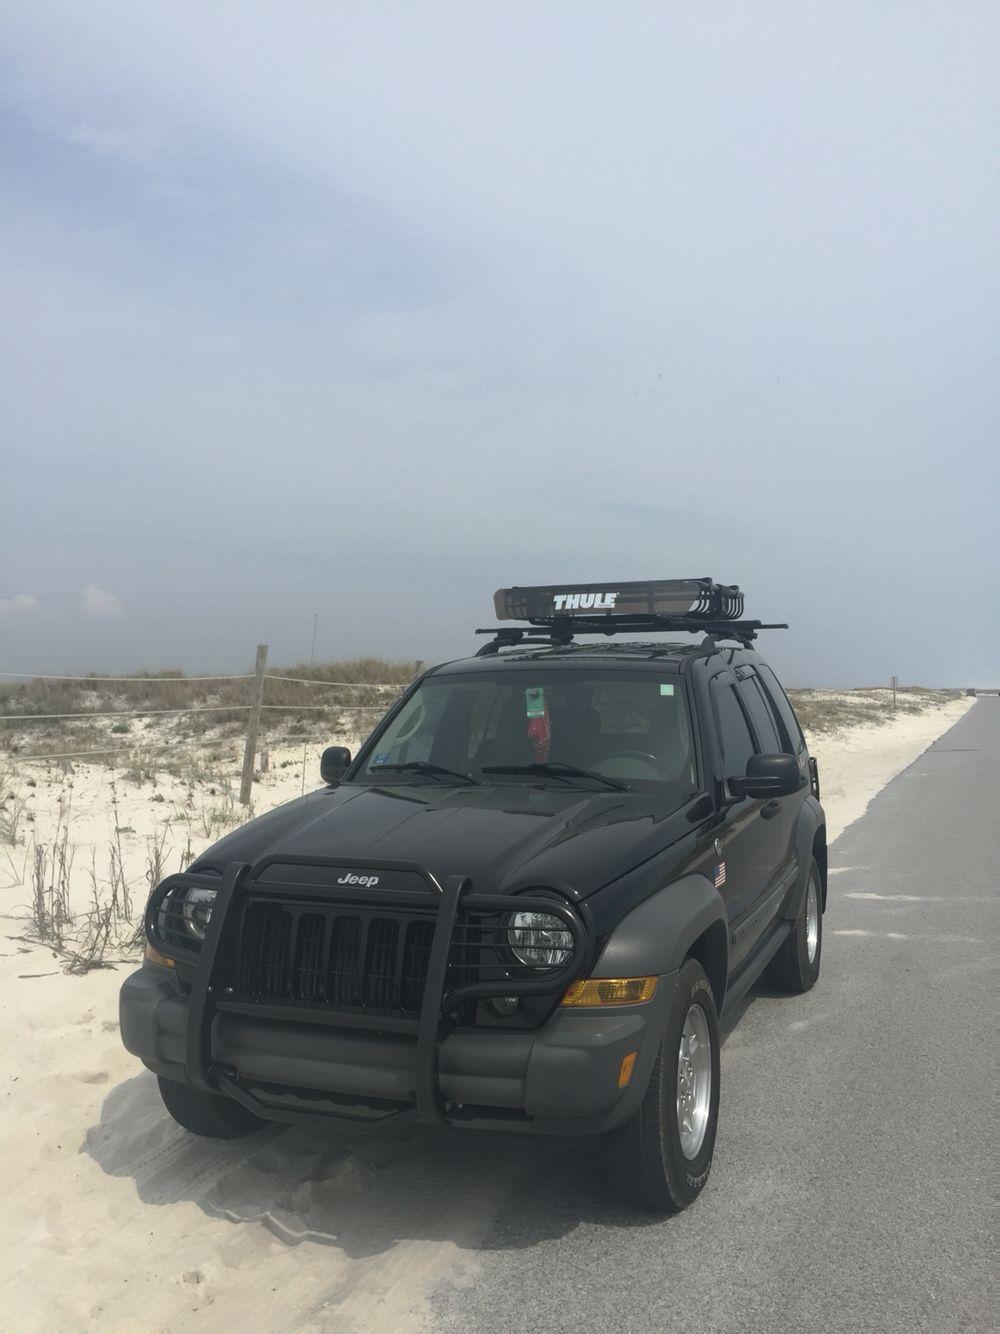 Jeep liberty 05